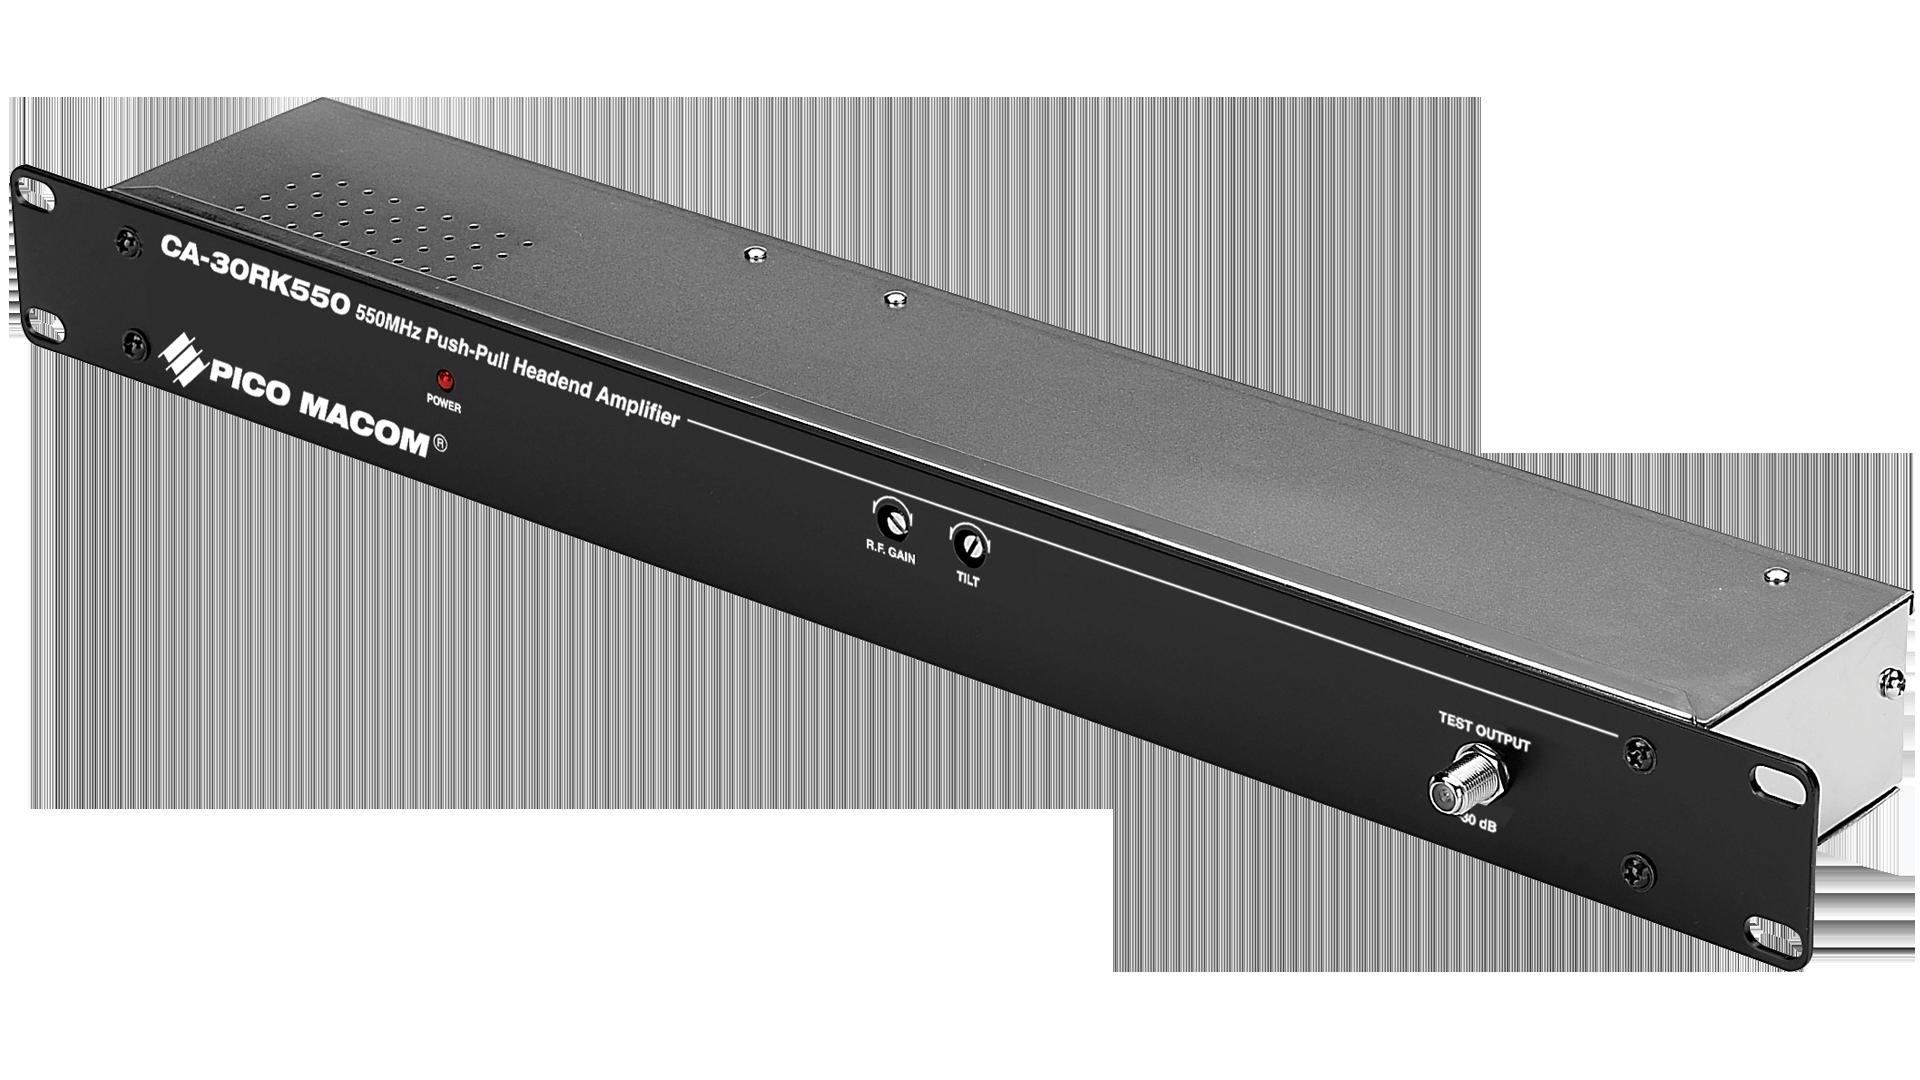 CA-30RK550: 550MHz Push-Pull Headend Amplifier